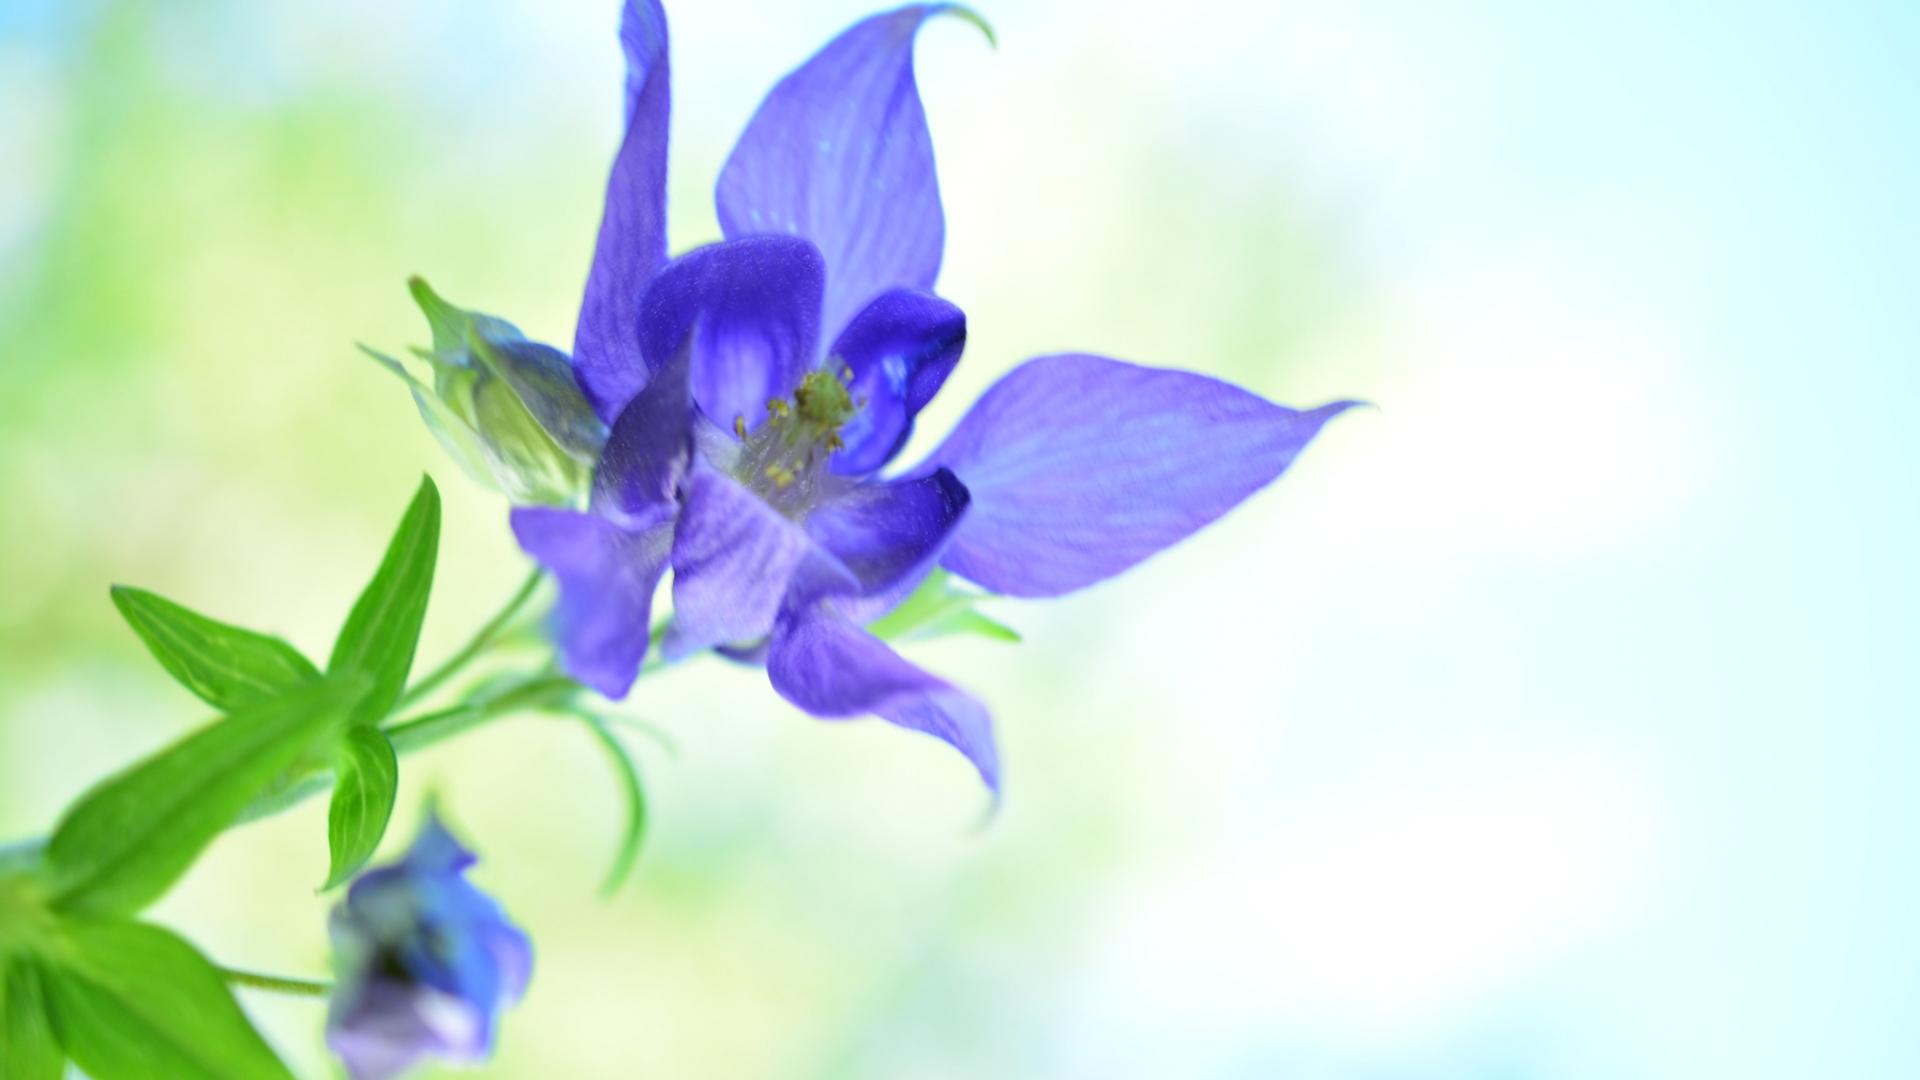 Bella flor azul - 1920x1080